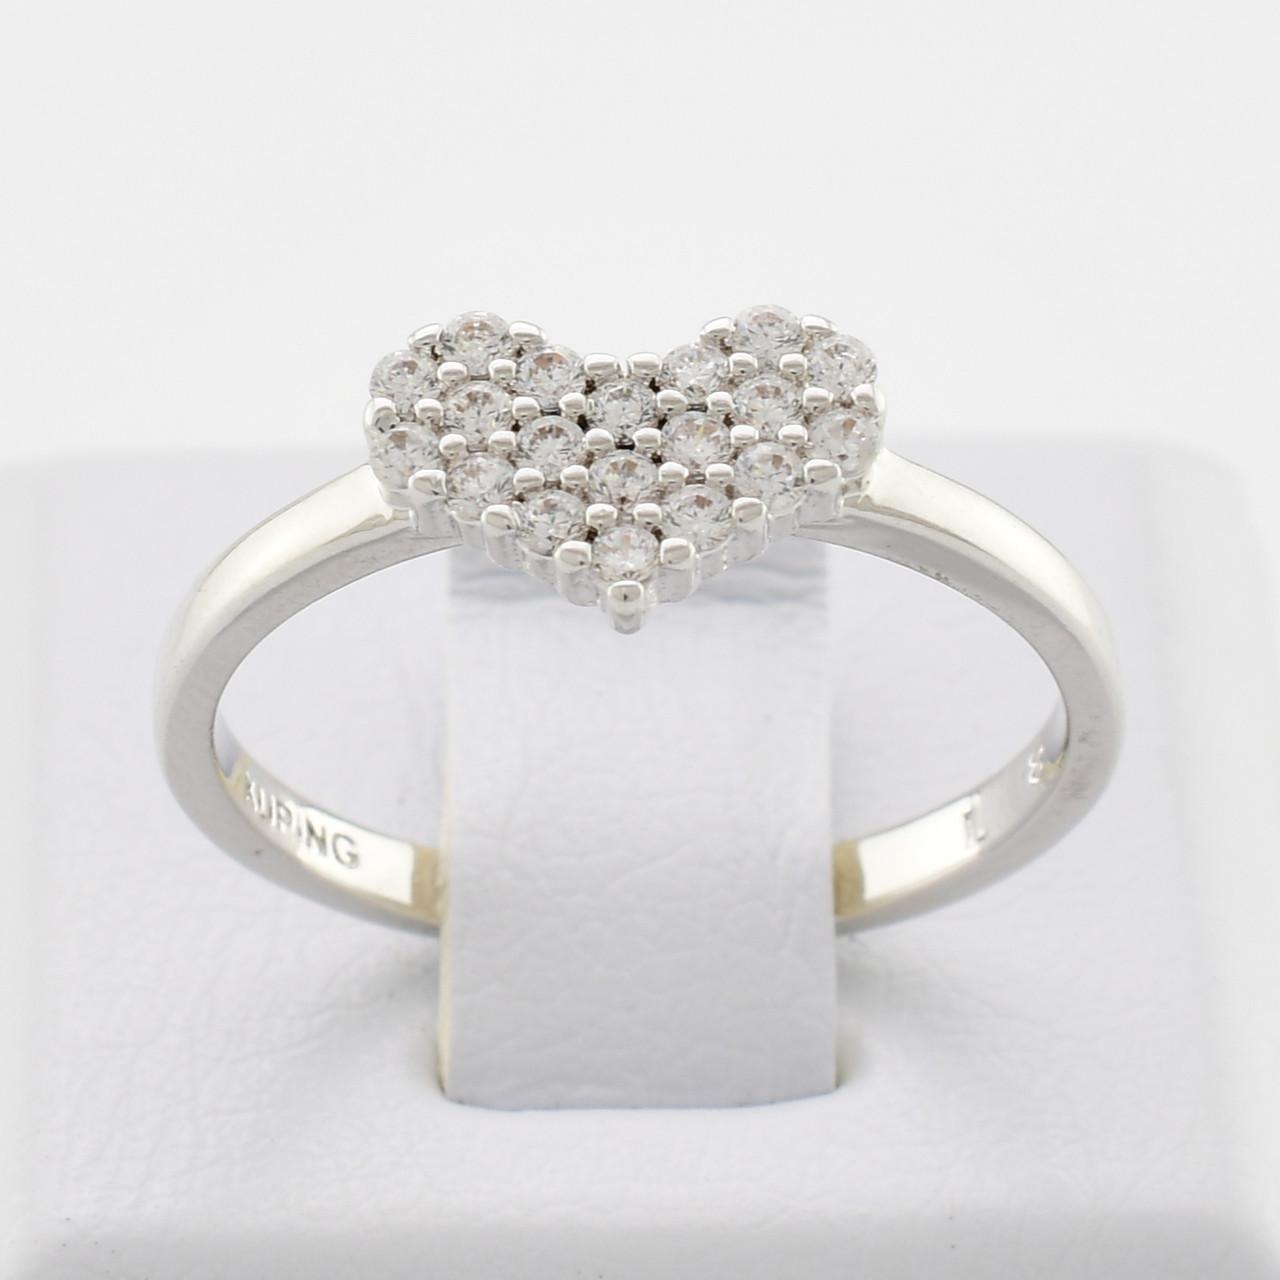 Кольцо Xuping 13647 размер 18 ширина 6 мм куб. цирконий вес 1.9 г Белое Золото